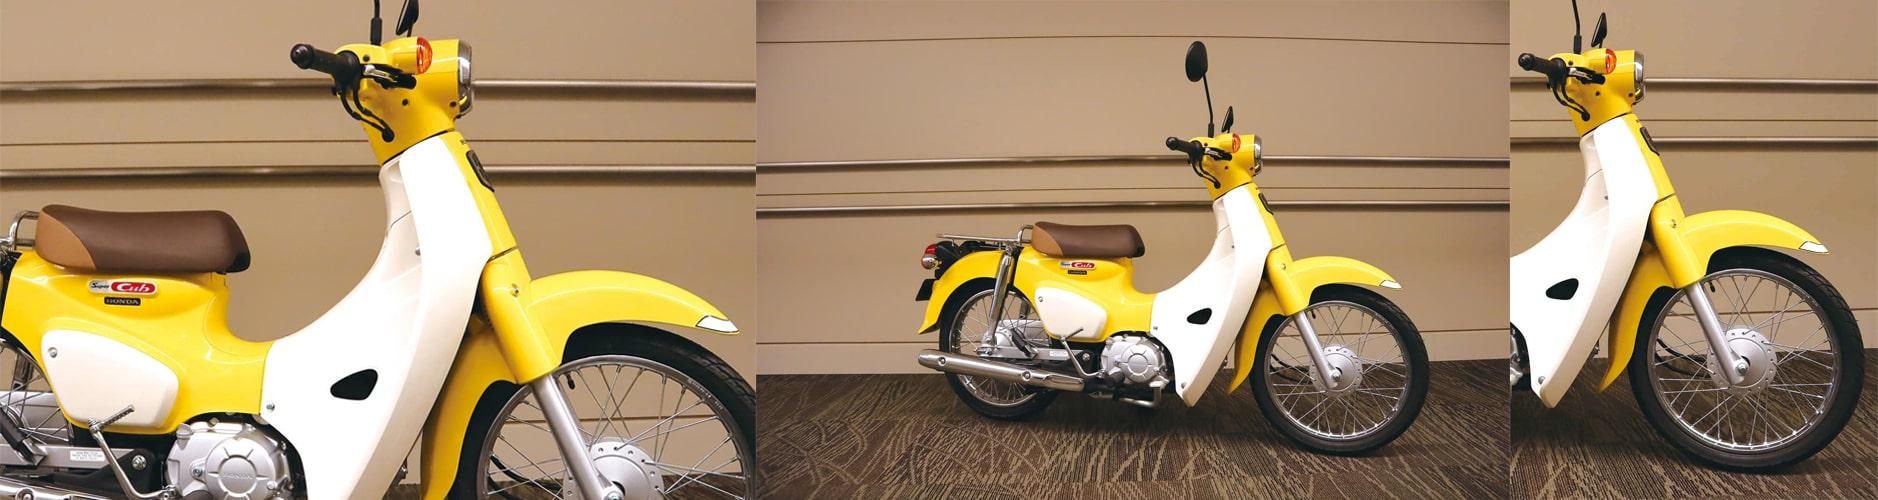 Super Cub 110 2020 สีเหลืองใหม่